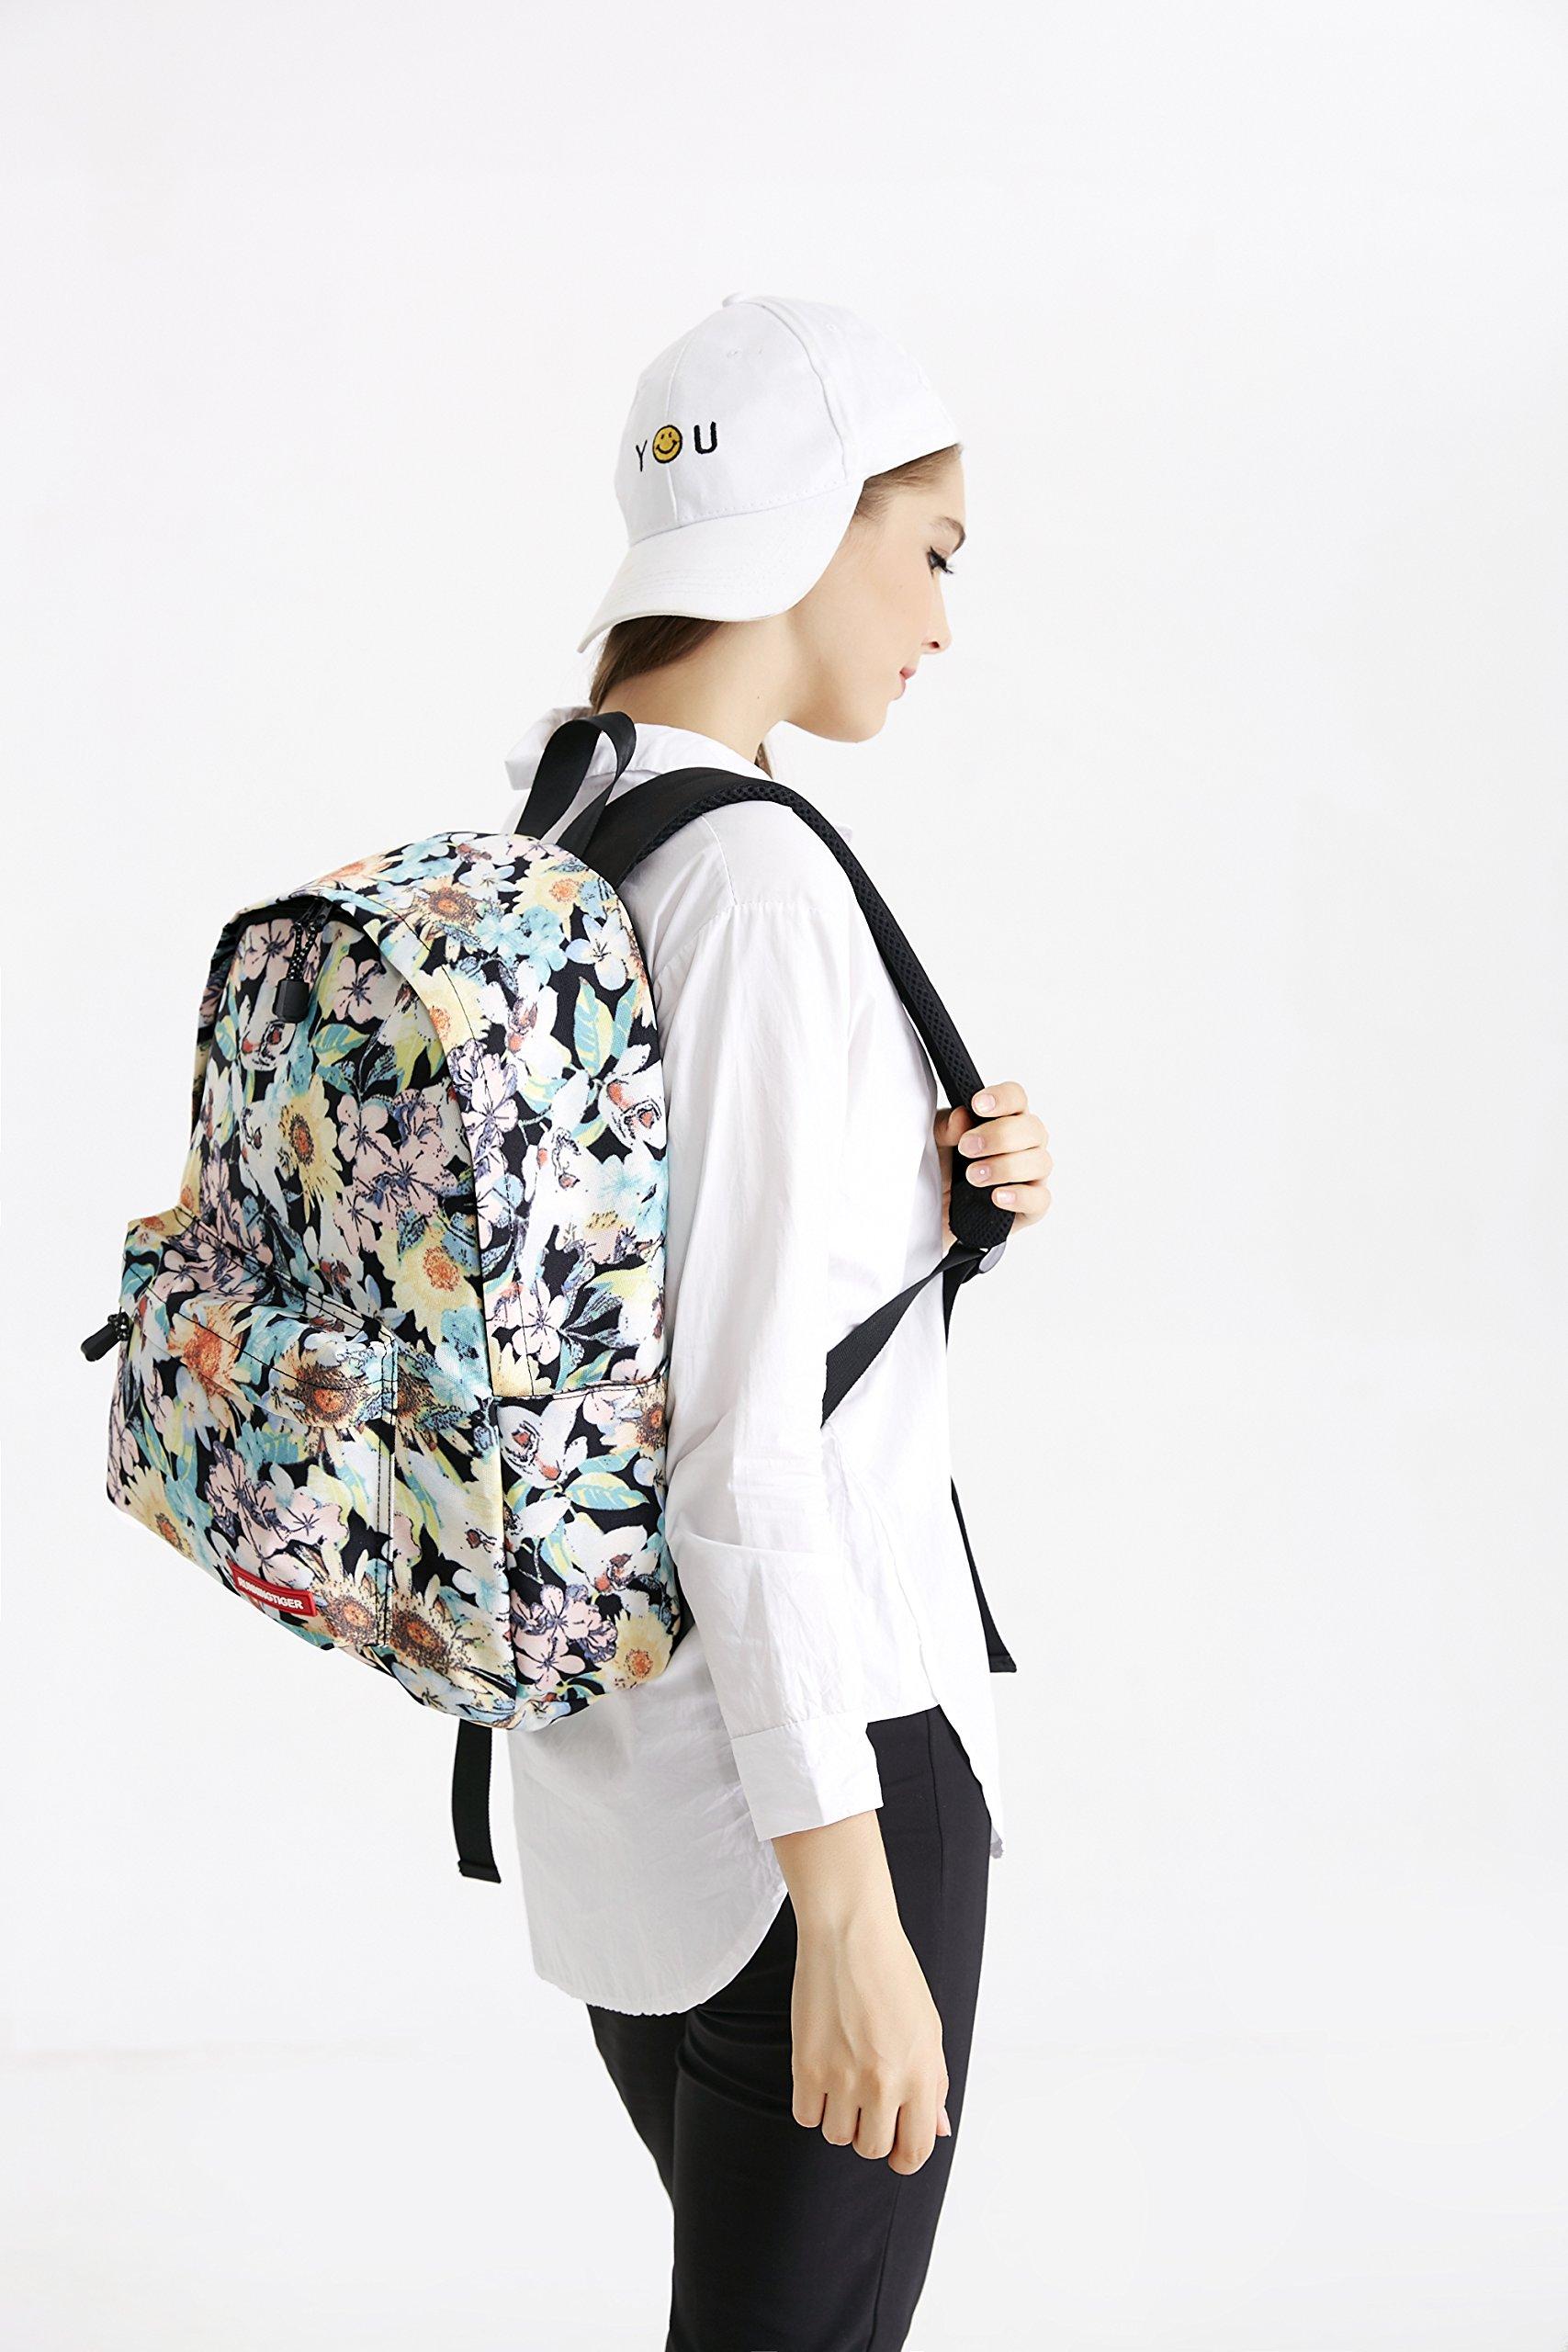 Canvas Backpack, Businda Cute Backpacks School Bookbags Printing Zipper Backpacks Fashion School Bags Casual Canvas Laptop Protective Rucksack for Kids Adults Boys Girls by Businda (Image #3)